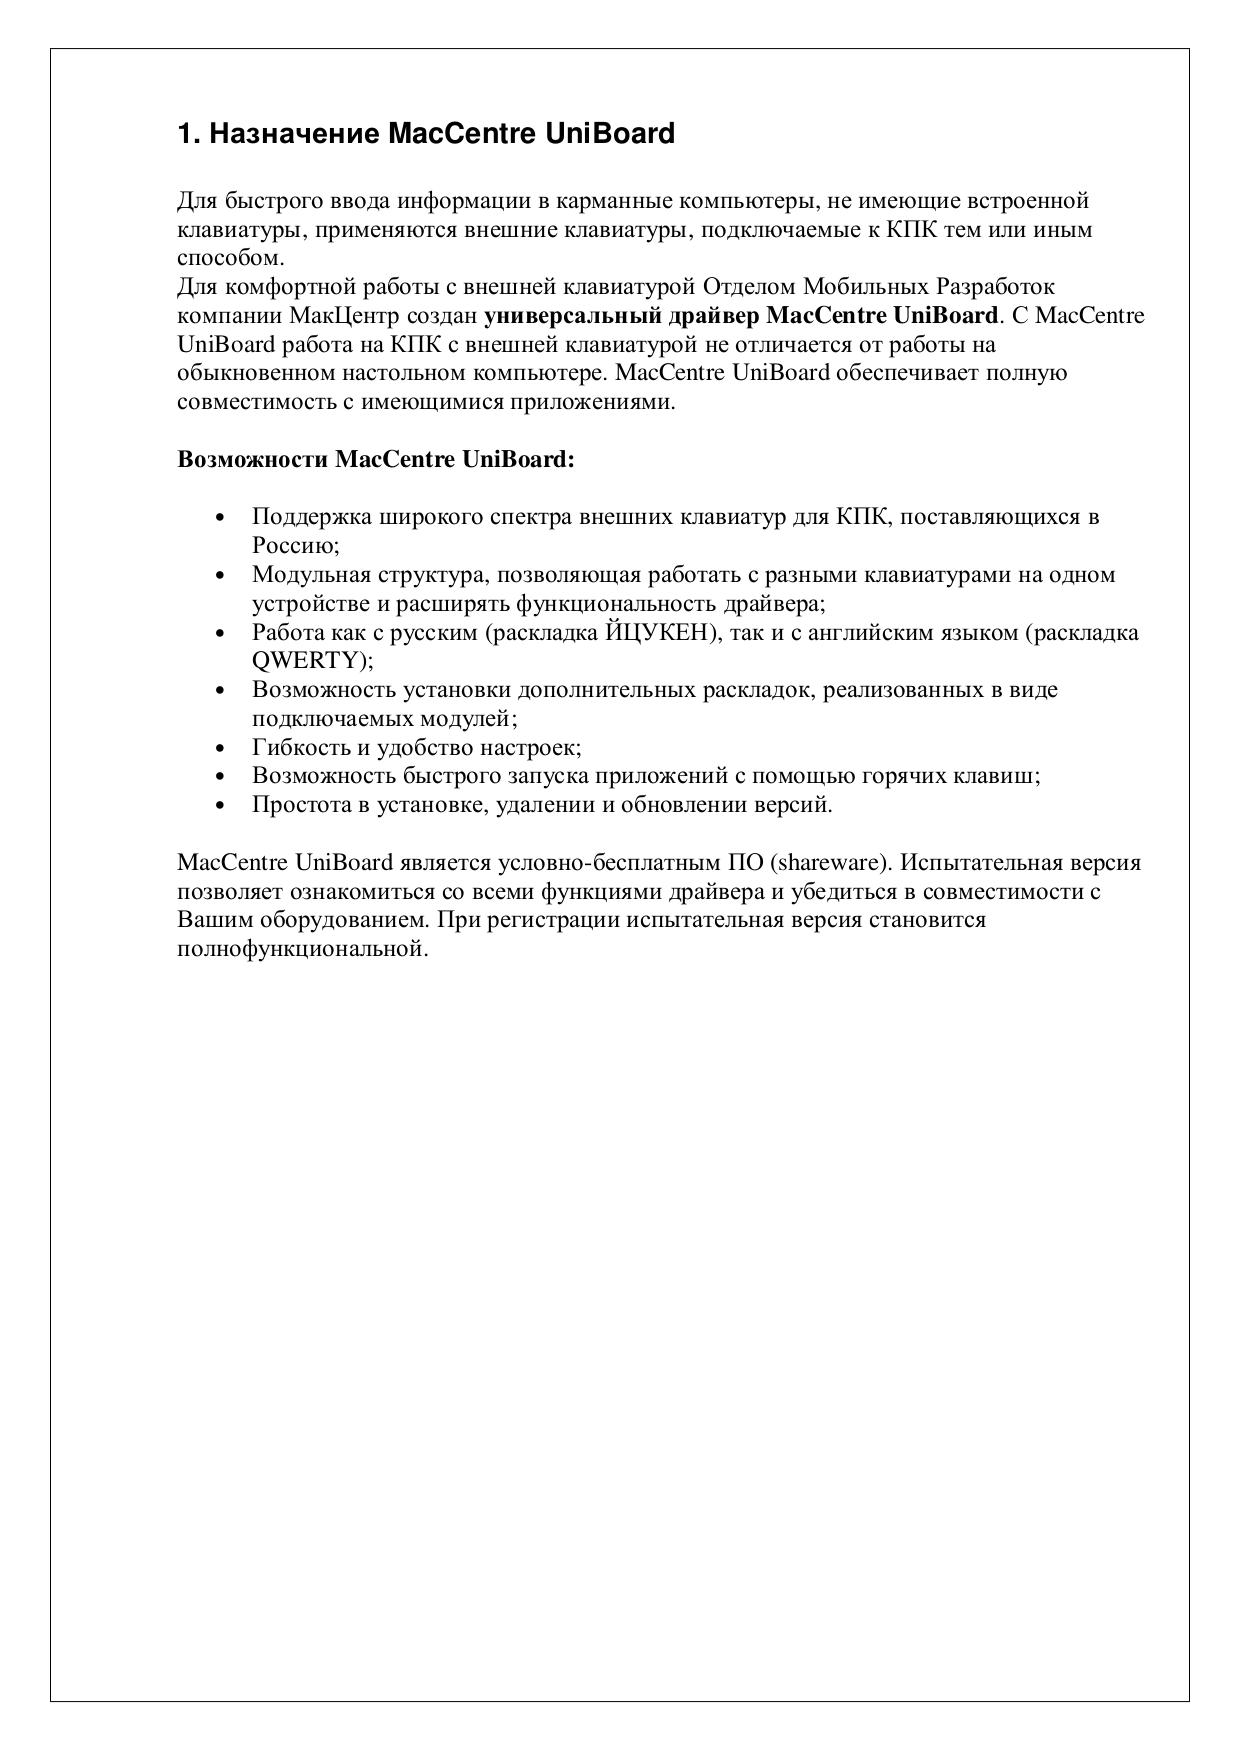 Hp ipaq rz1710 user manual by purwadi87mala issuu.